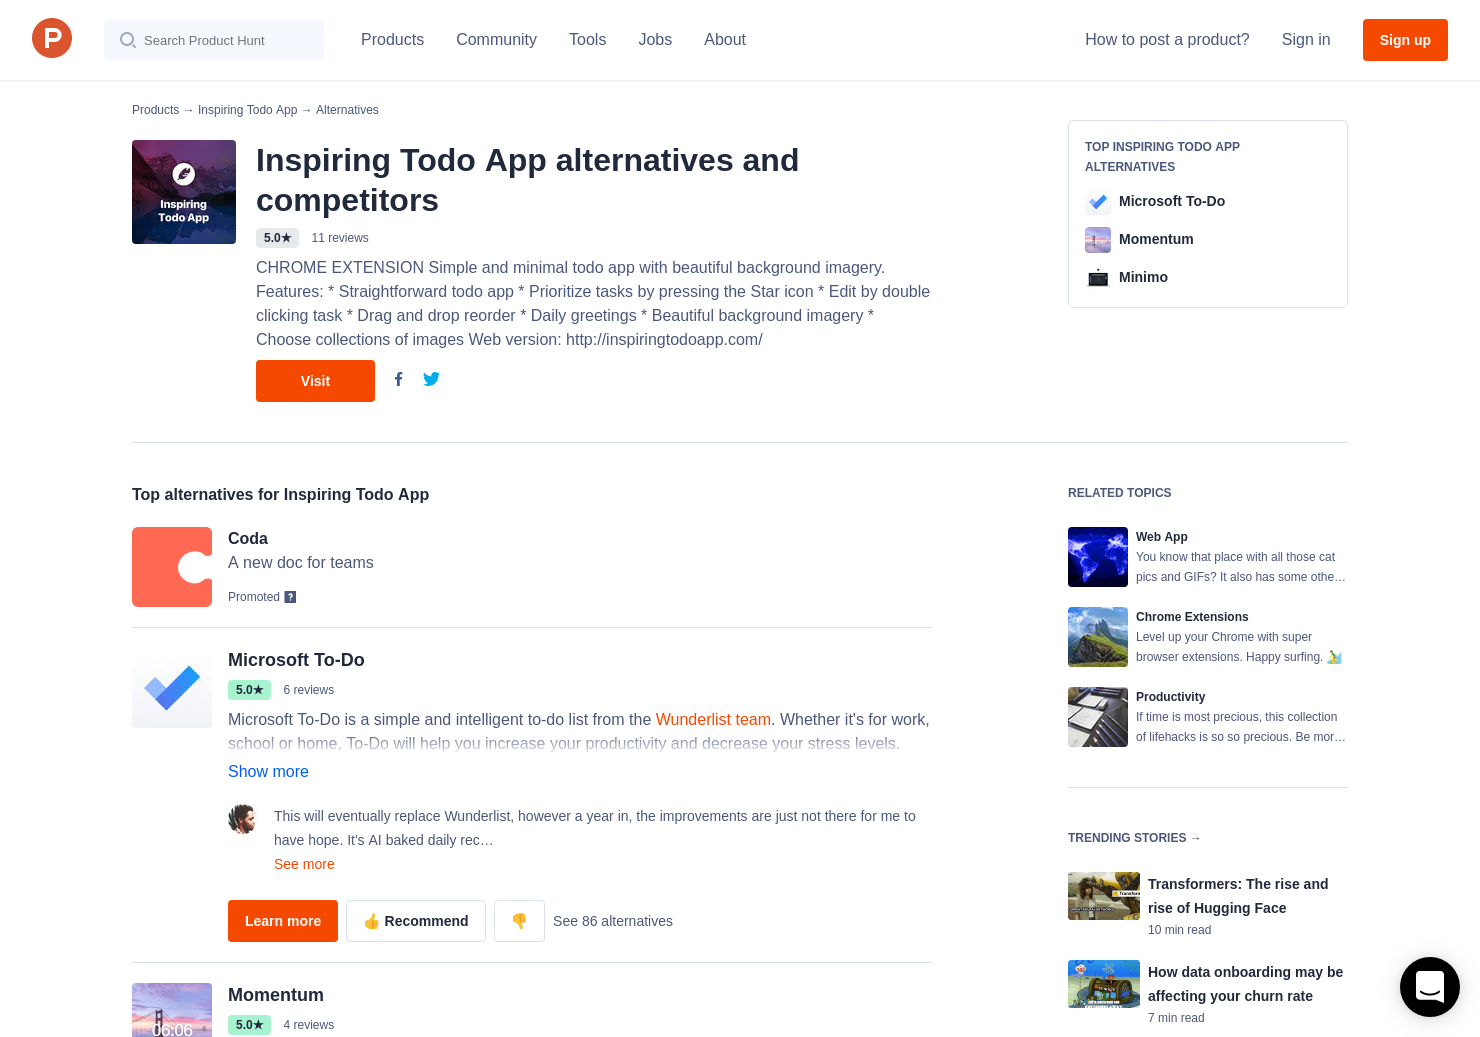 17 Alternatives to Inspiring Todo App for Chrome Extensions